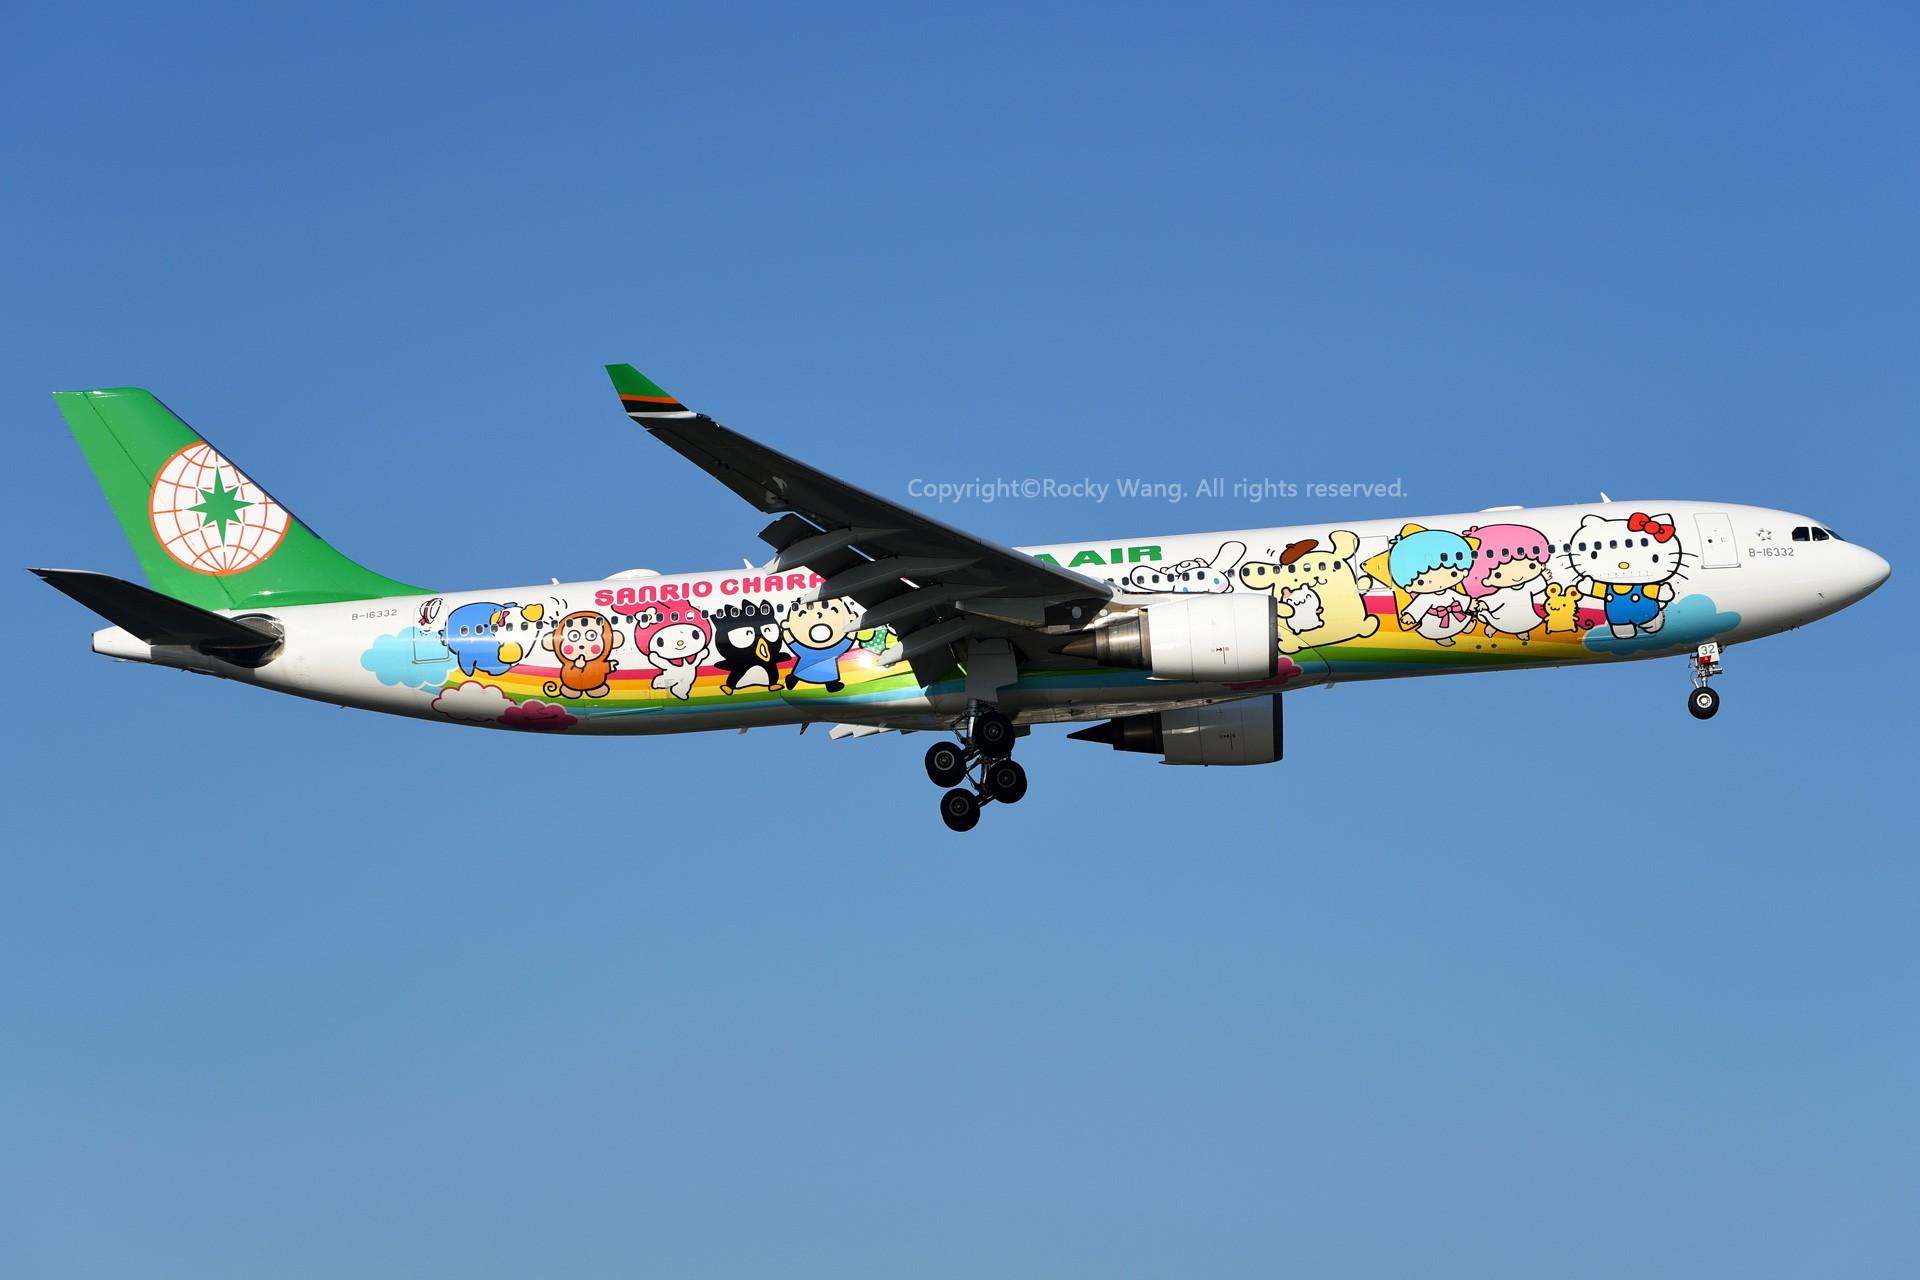 Re:[原创]A330s Around the World AIRBUS A330-300 B-16332 中国上海虹桥国际机场